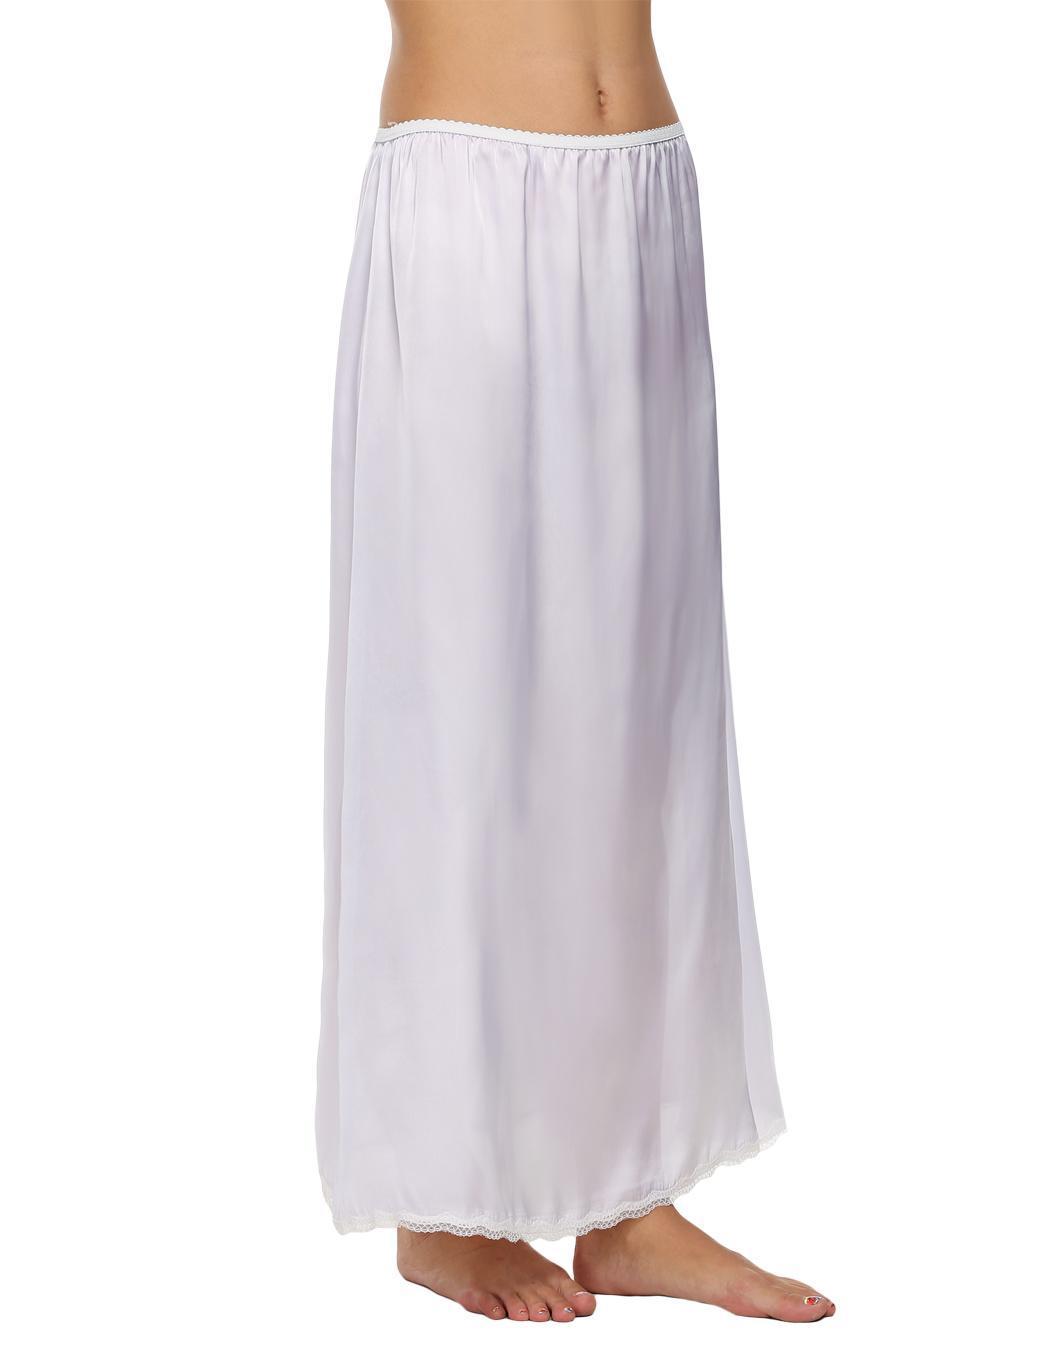 Women Satin Solid Lace Trim Maxi Half Slip Underskirt Slip Skirt 4